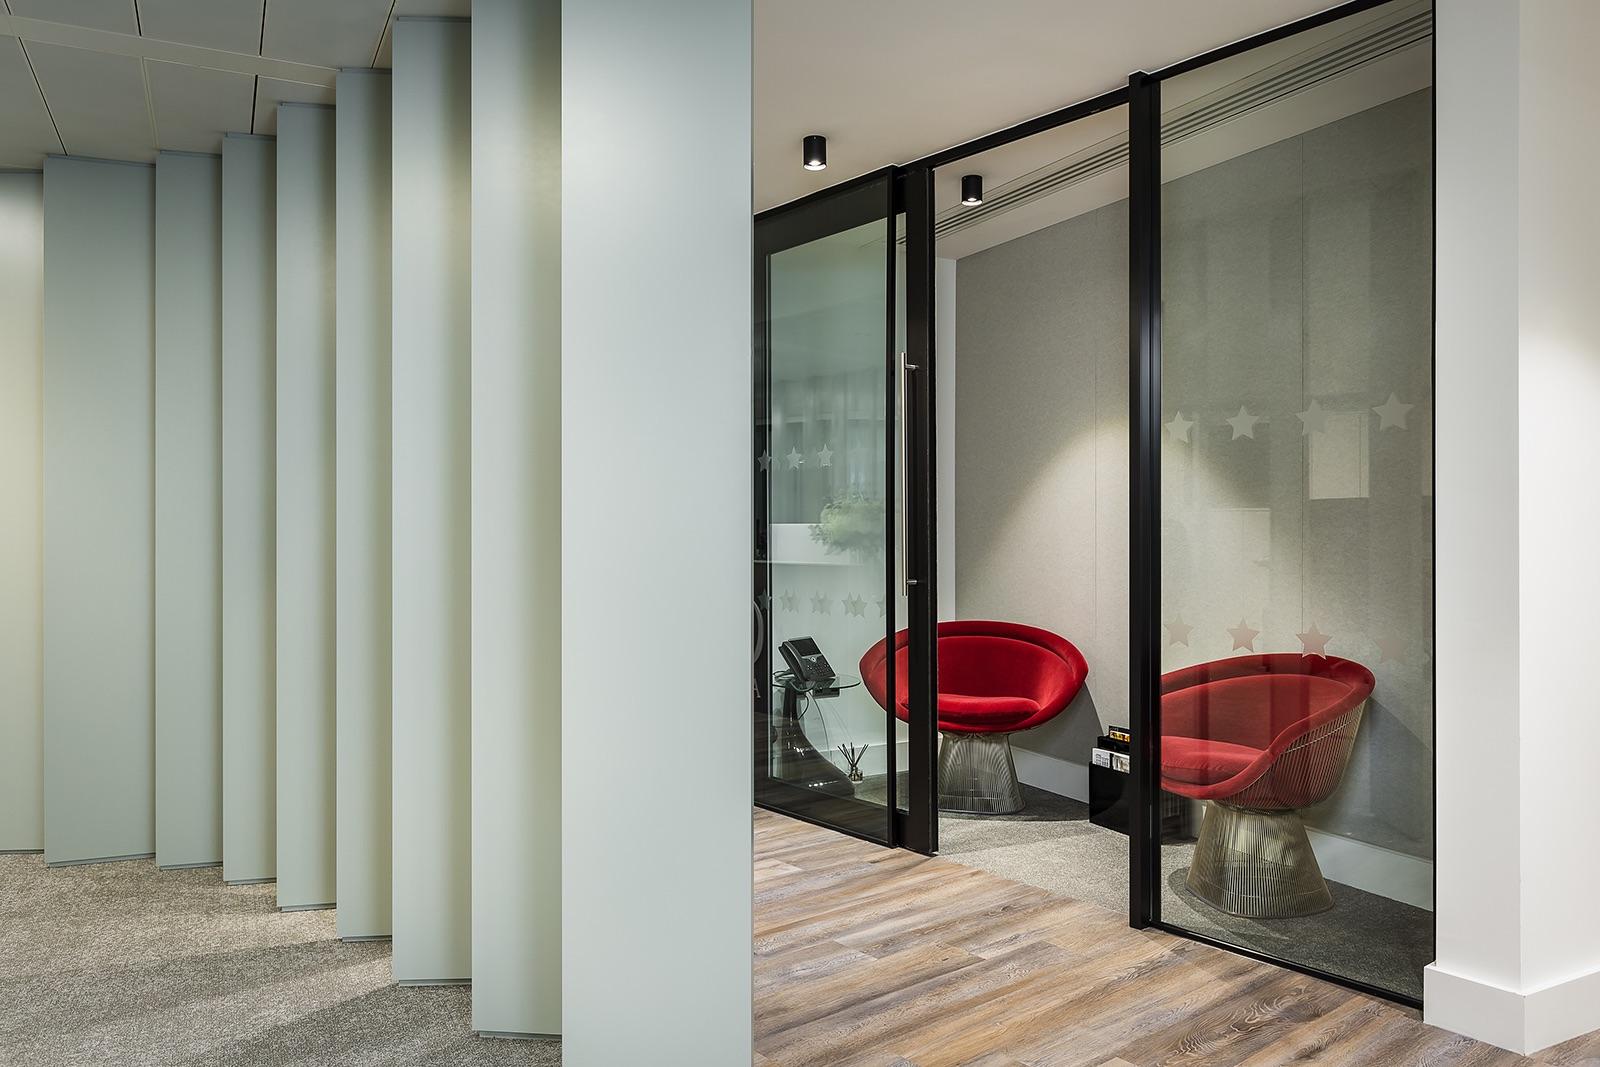 crux-office-london-4